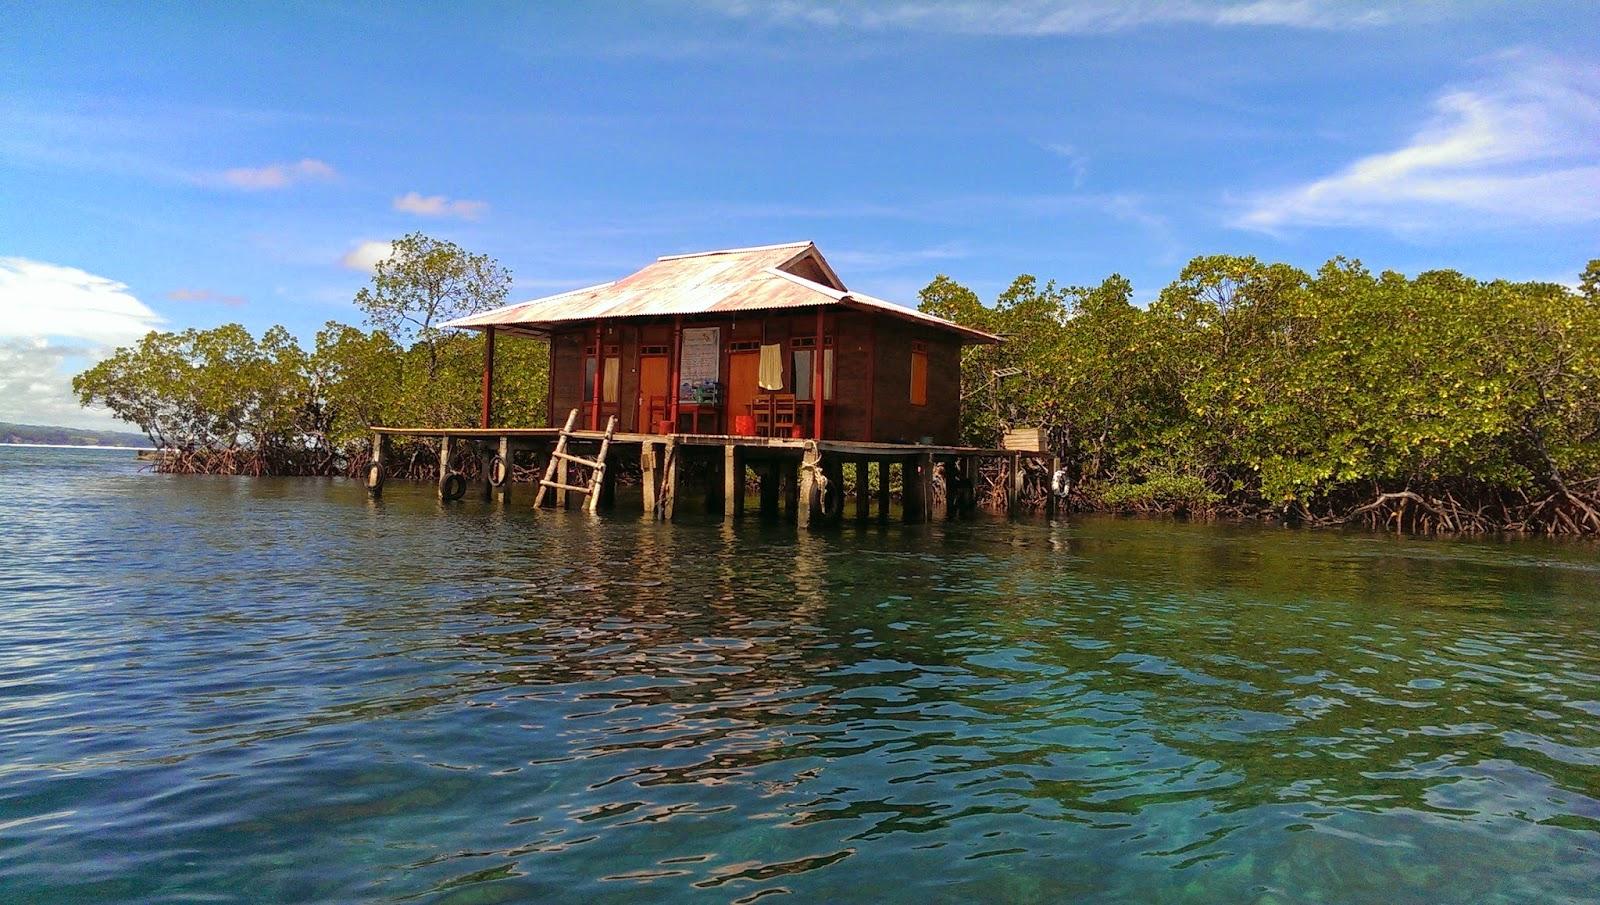 Wisata Sulawesi Utara Tumbak Jelajah Indonesia Water Cottage Taman Laut